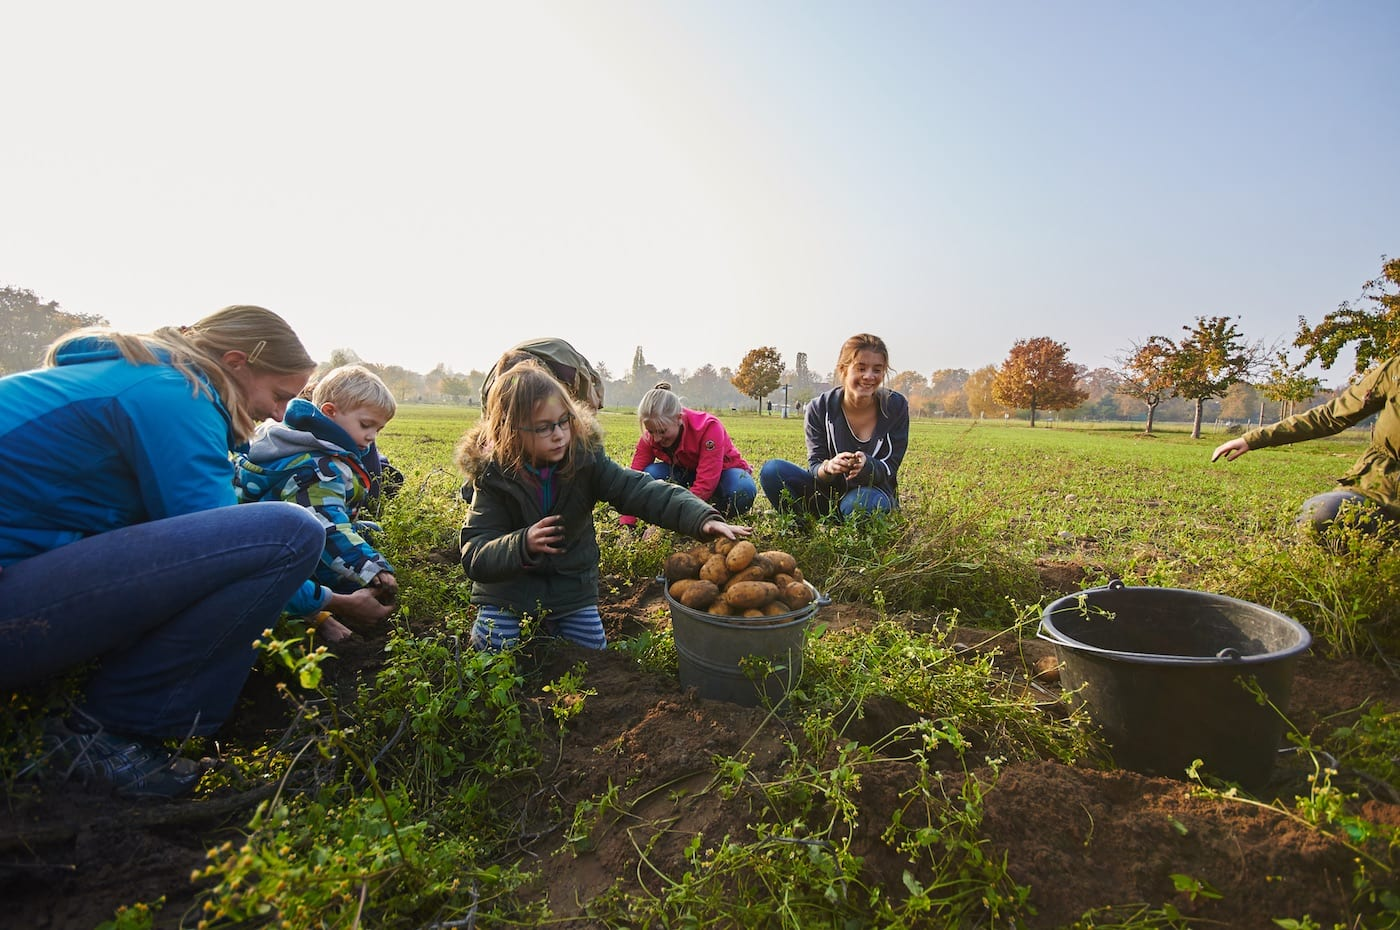 Kartoffelernte Kartoffelfest Domäne Dahlem Berlin mit Kind // HIMBEER